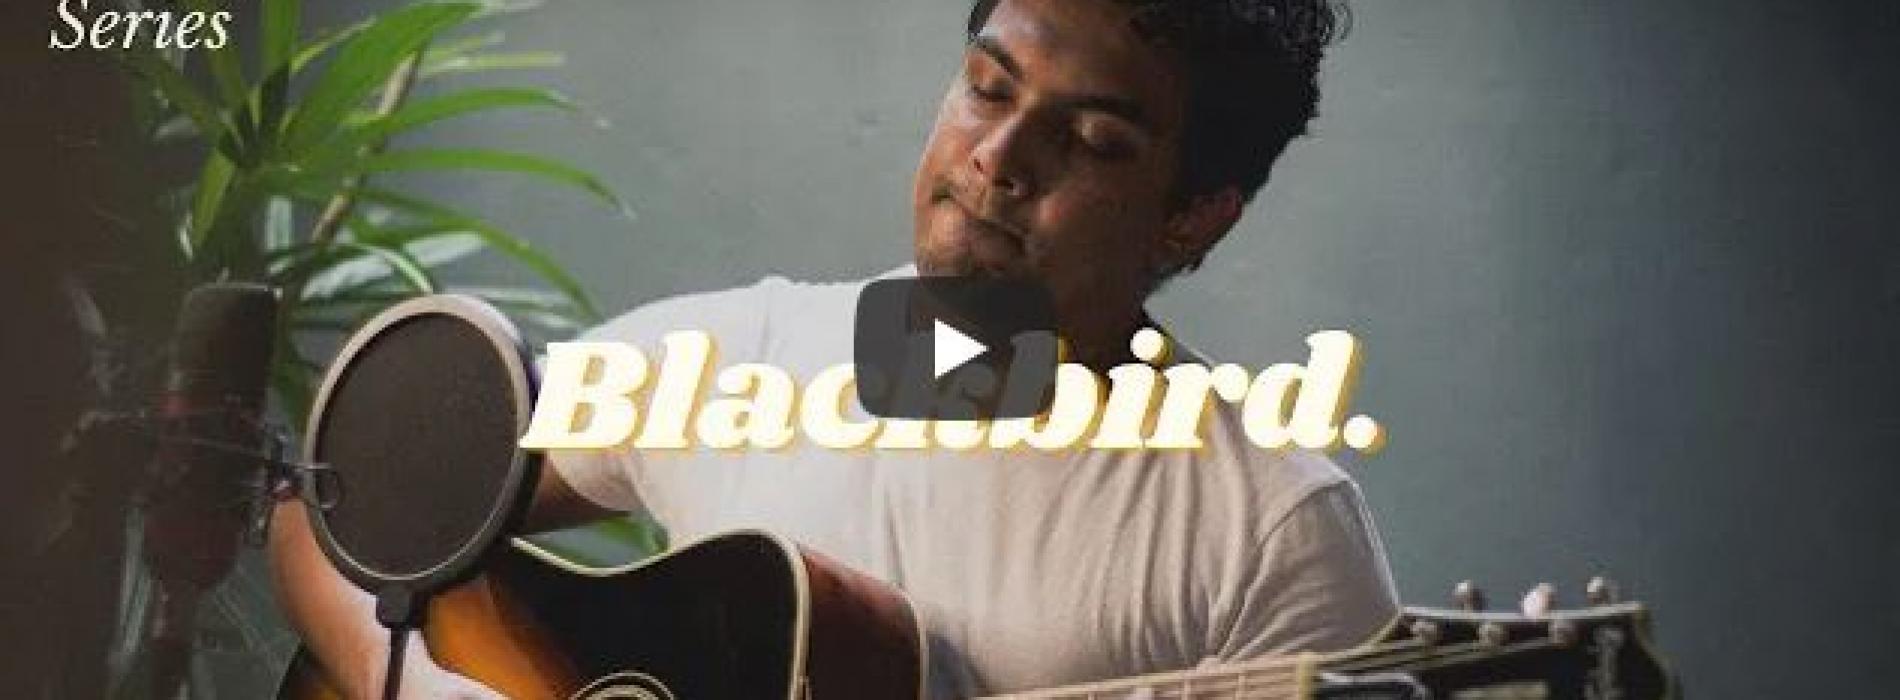 New Music : The Beatles – Blackbird (Ryan De Mel Acoustic Cover)   The Classic Series Ep: 2